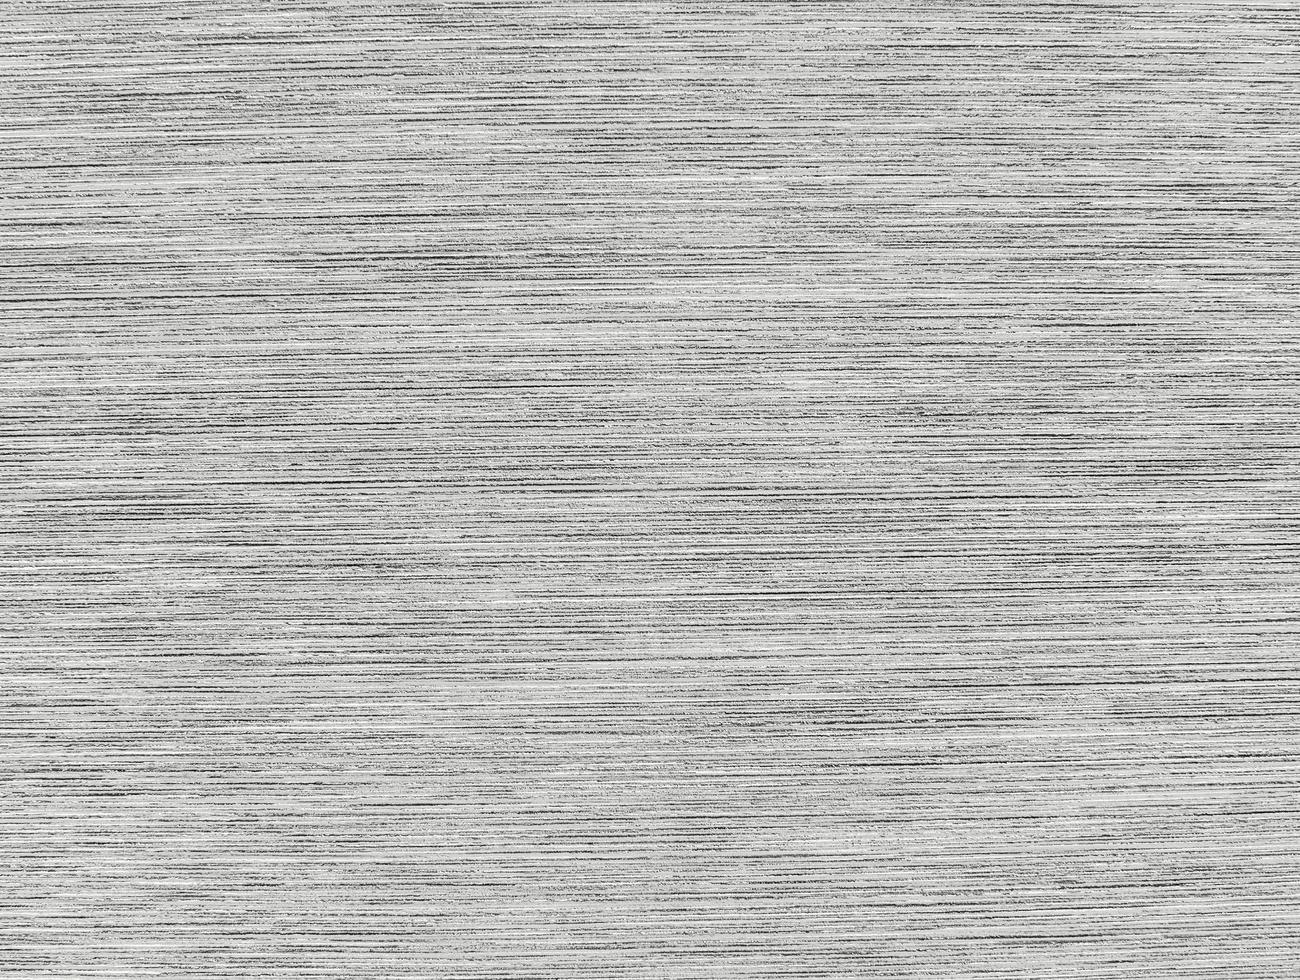 textura de papel limpo alinhado foto